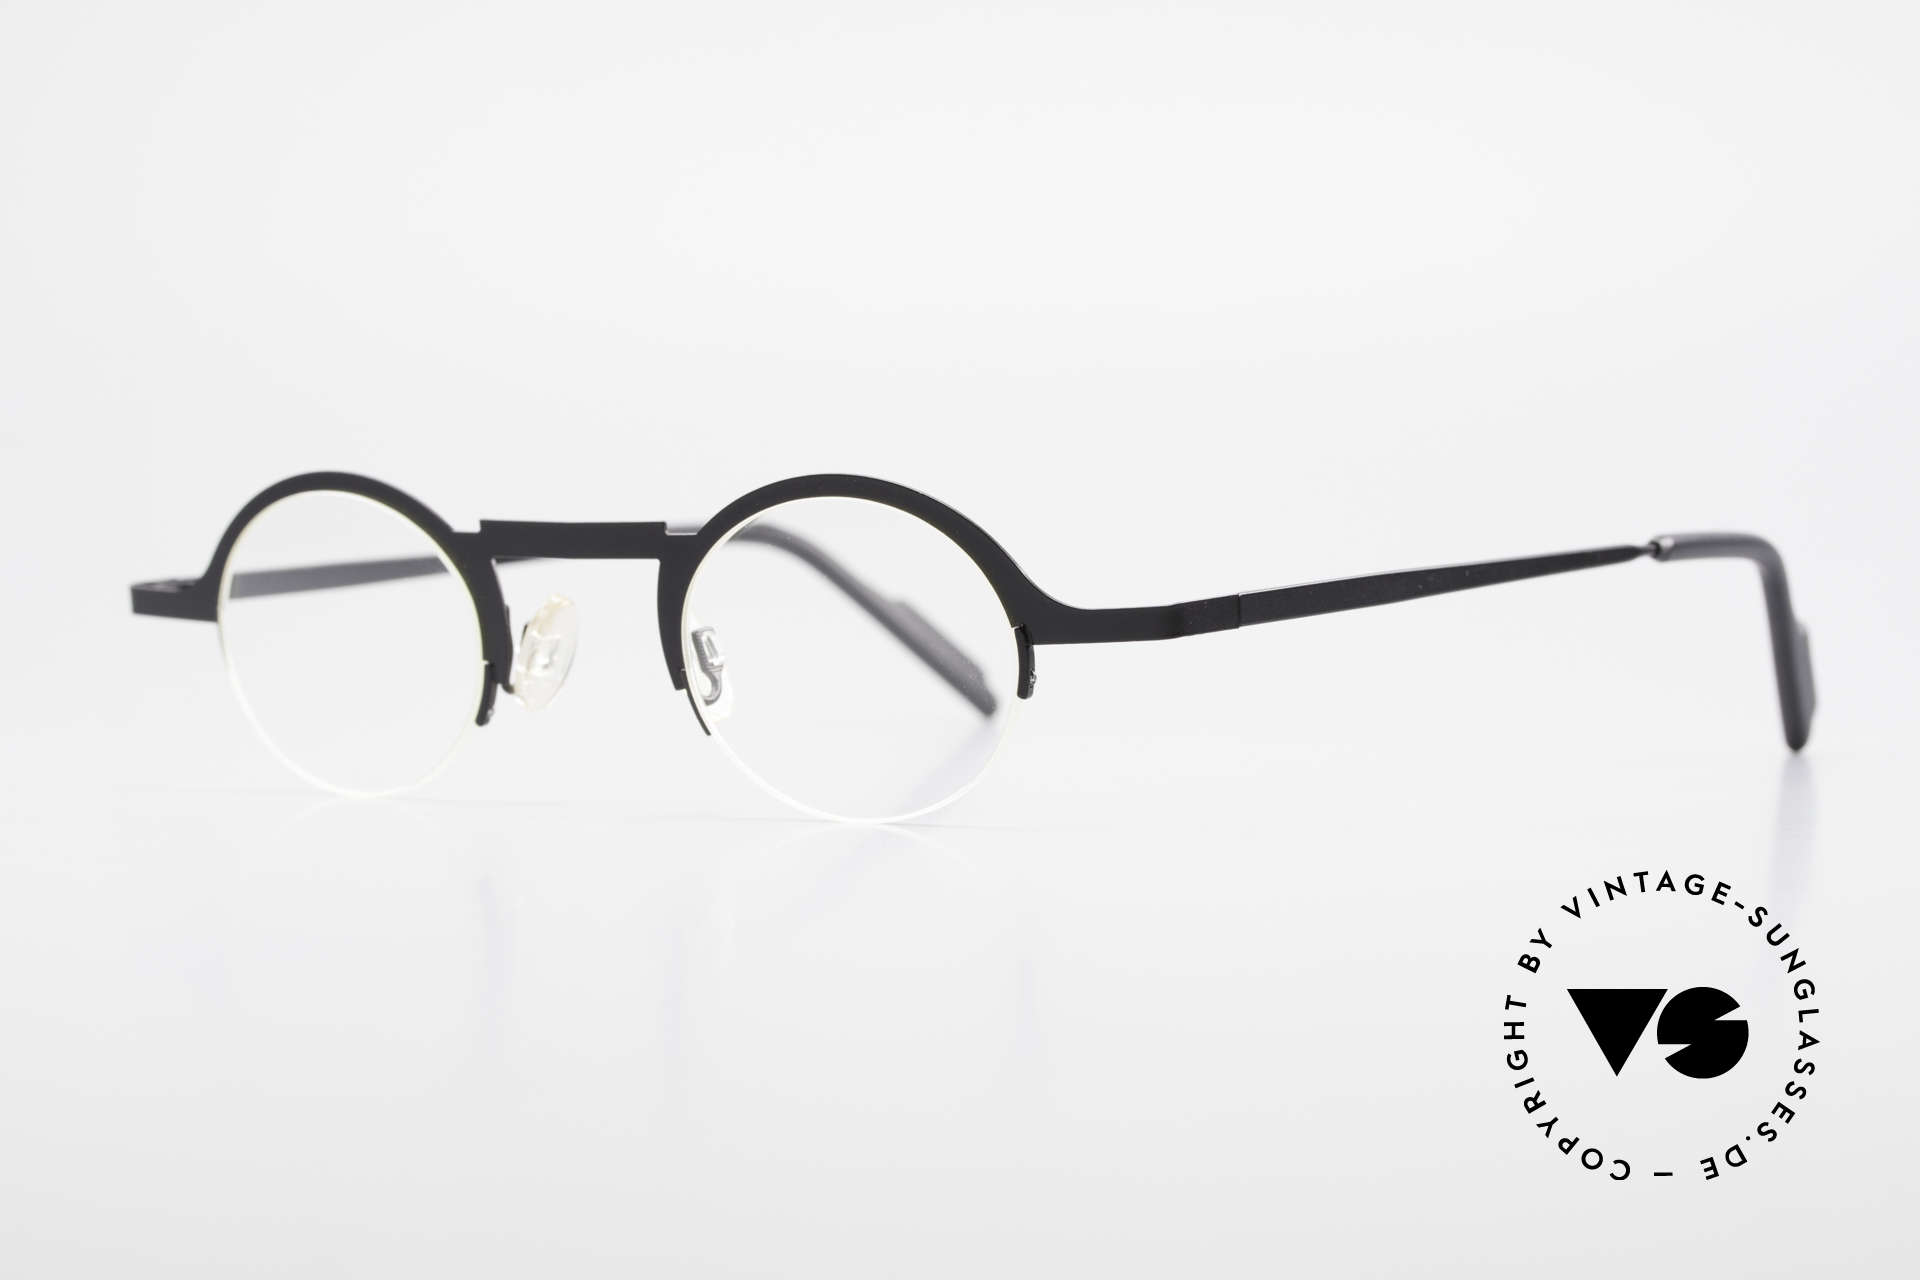 Theo Belgium Triptrio Round Designer Eyeglasses, round frame design; semi rimless, dulled black finish, Made for Men and Women